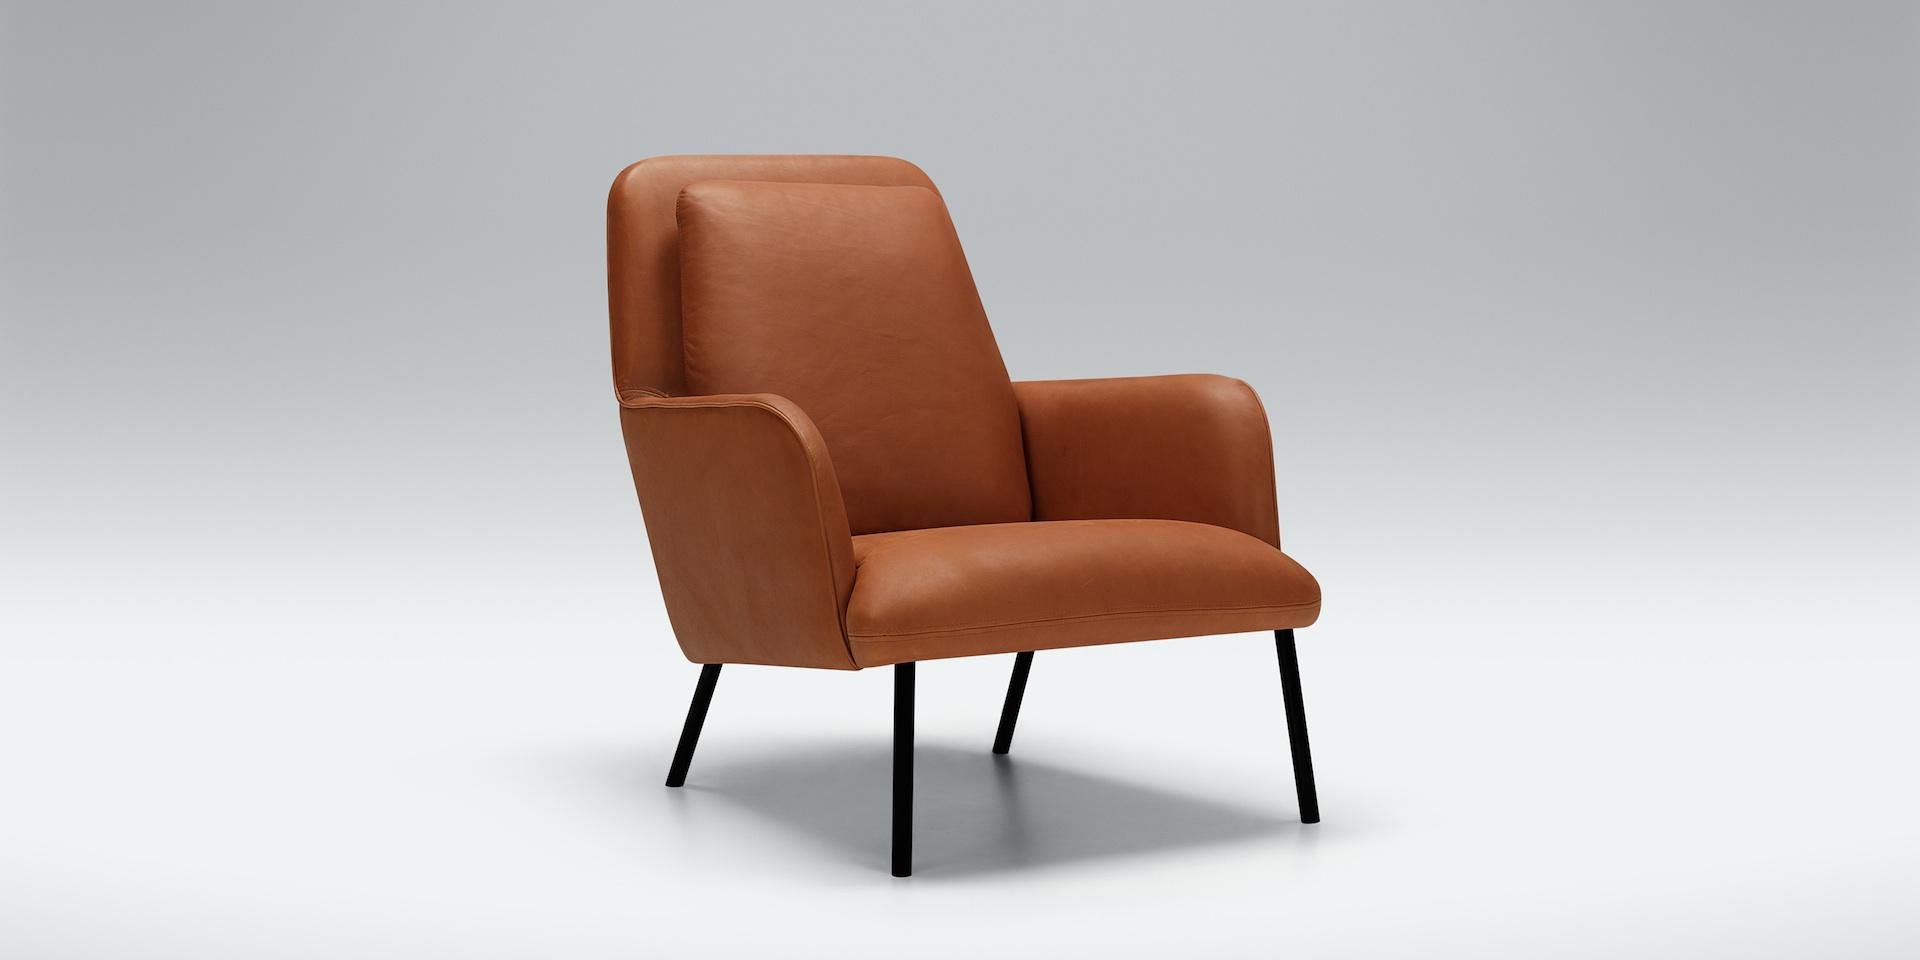 OLIVER_shadow_armchair_aniline2_cognac_2